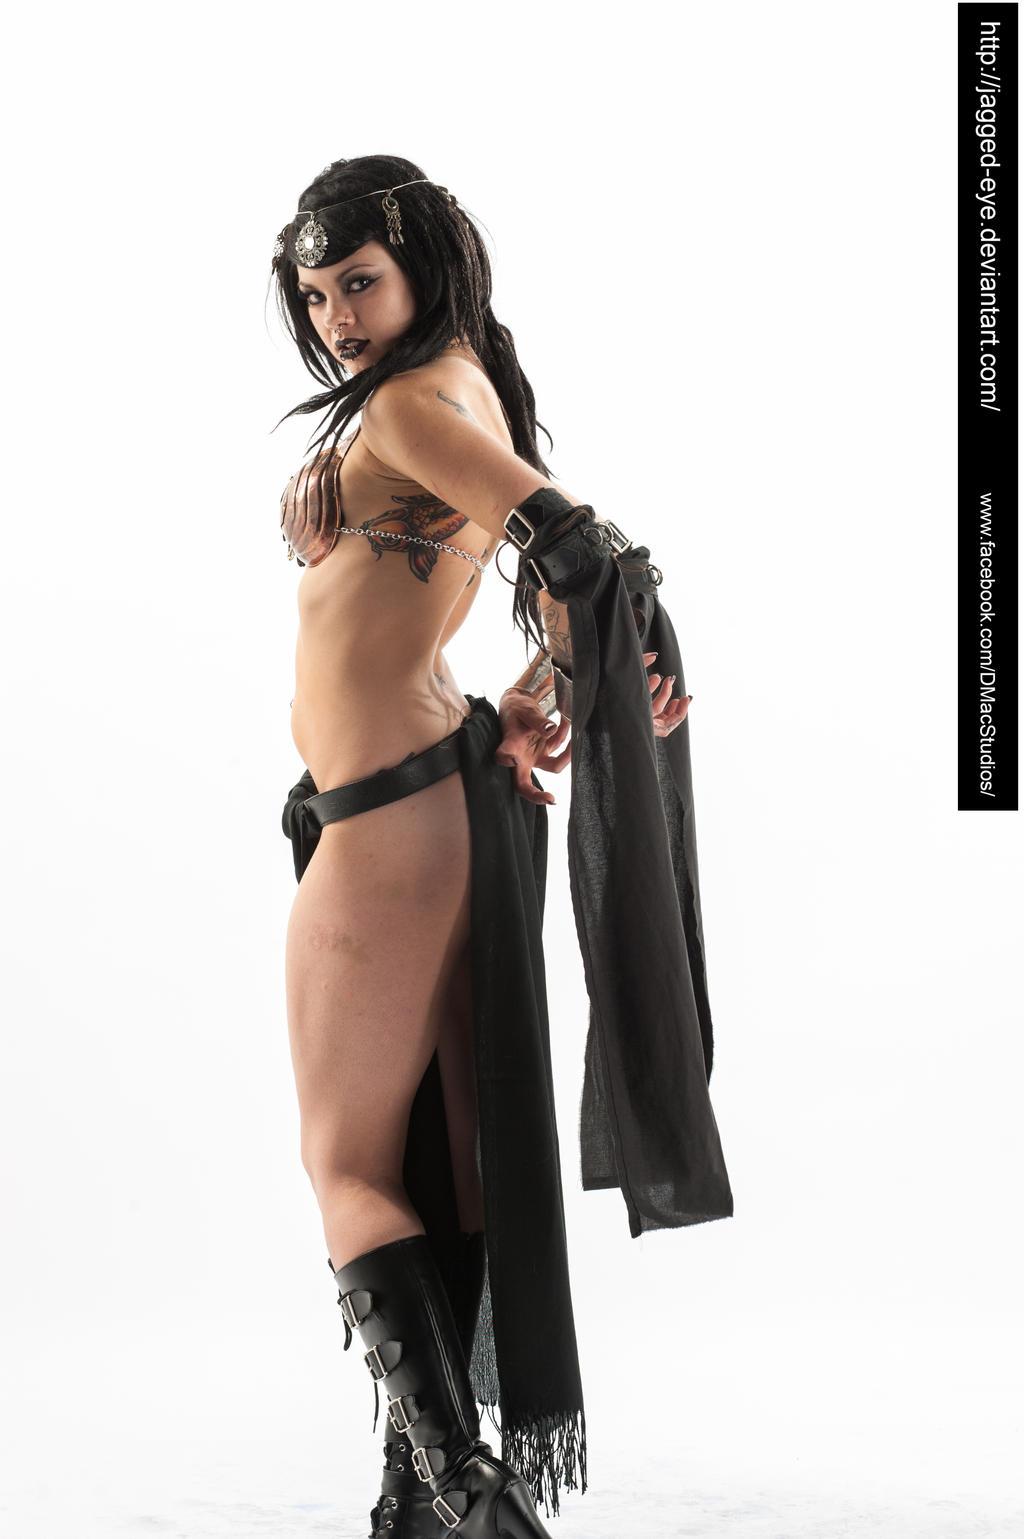 Talyn Sorceress-267